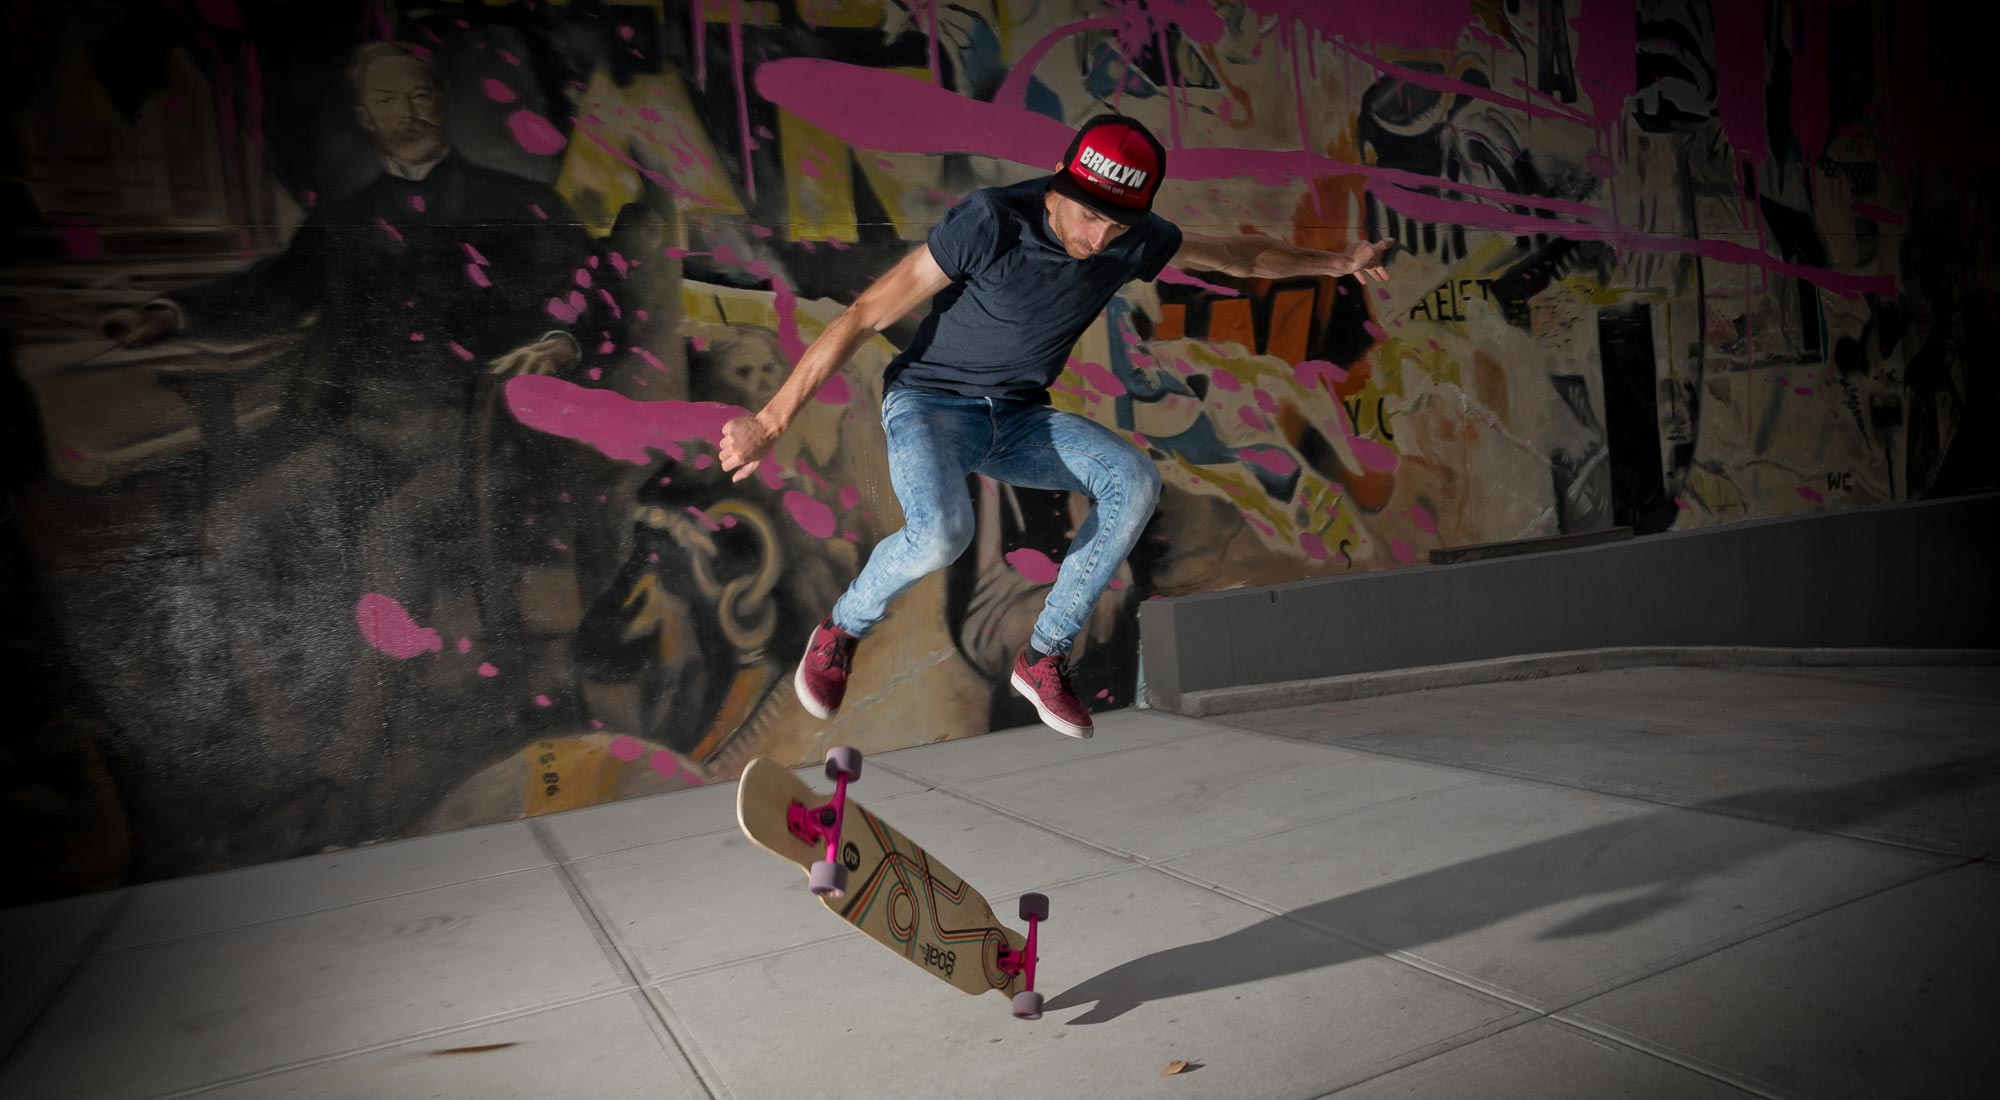 sergio valdehita patinando tabla carving feestyle longboard bamboo soul lija goatlongboards